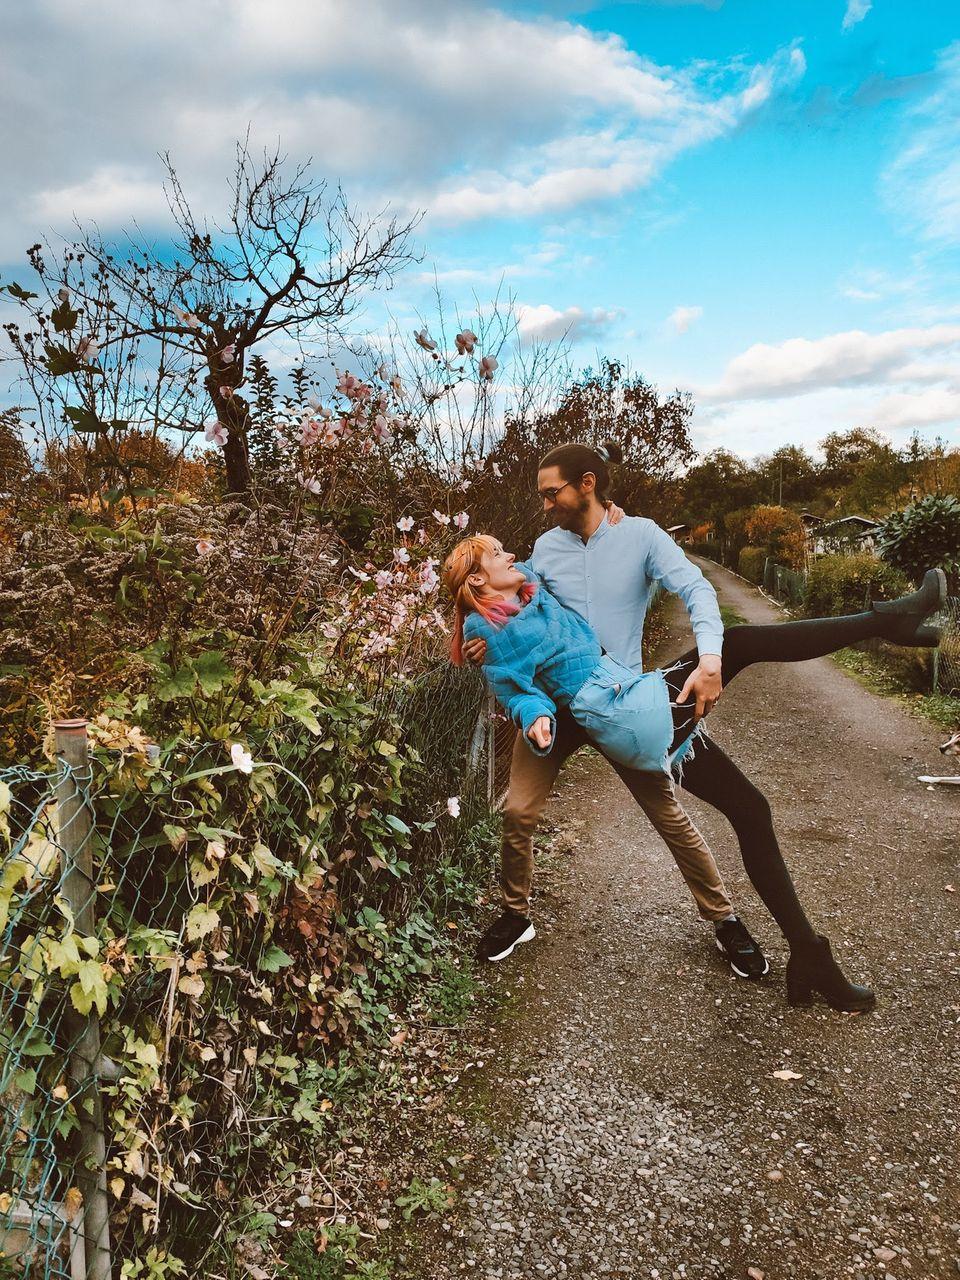 Pränataldiagnostik: Mavin hält Jana im Arm